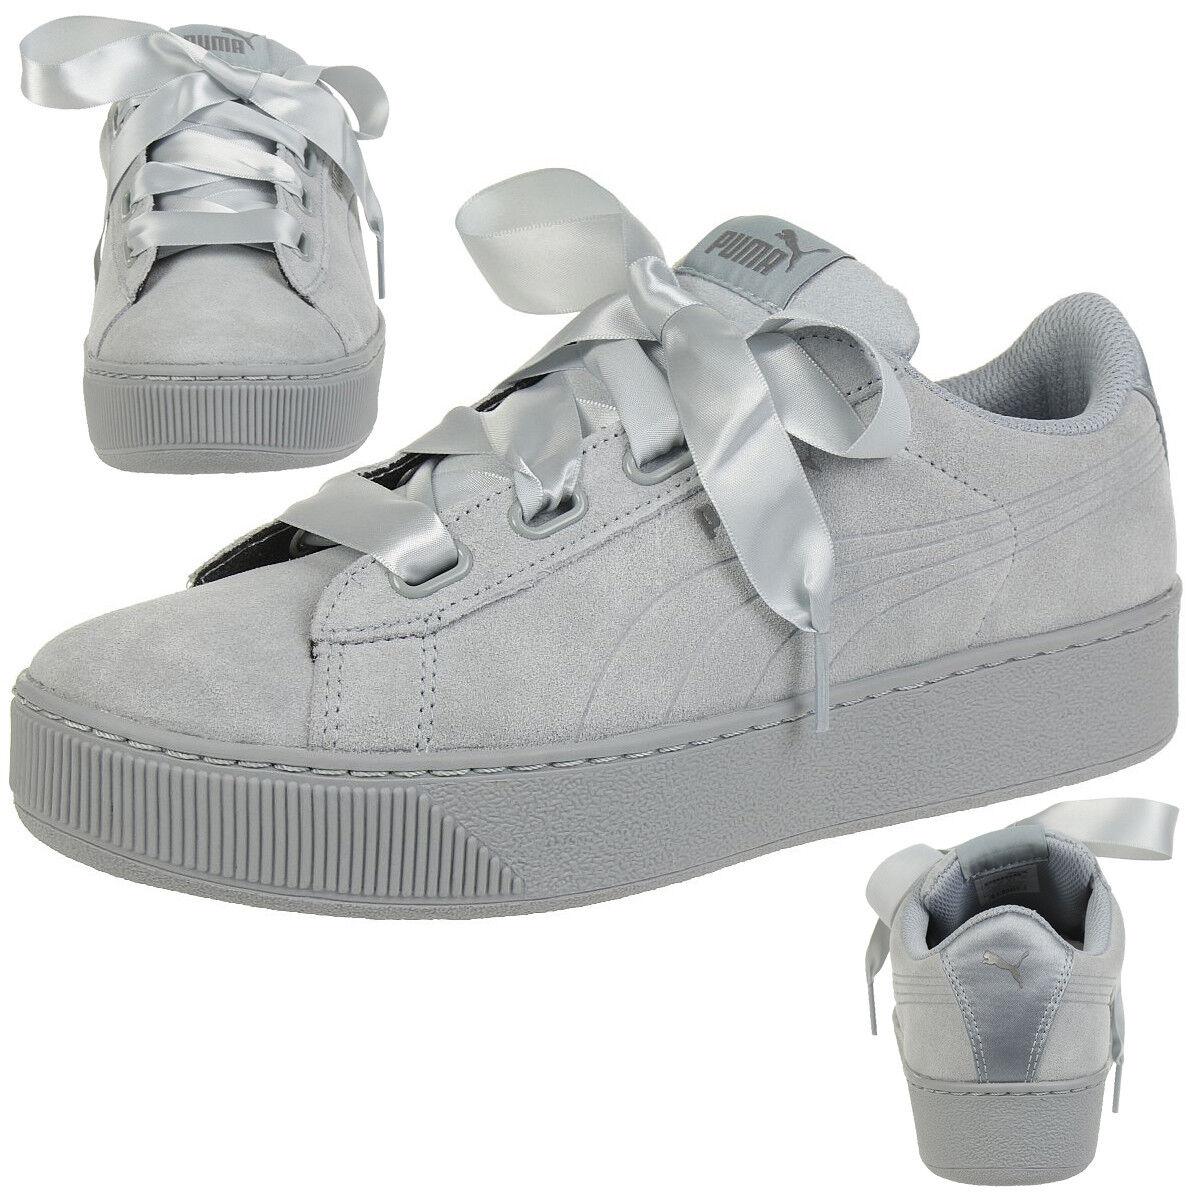 Puma Vikky Platform Ribbon S Leather scarpe da ginnastica Wouomo scarpe 366418 02 grigio